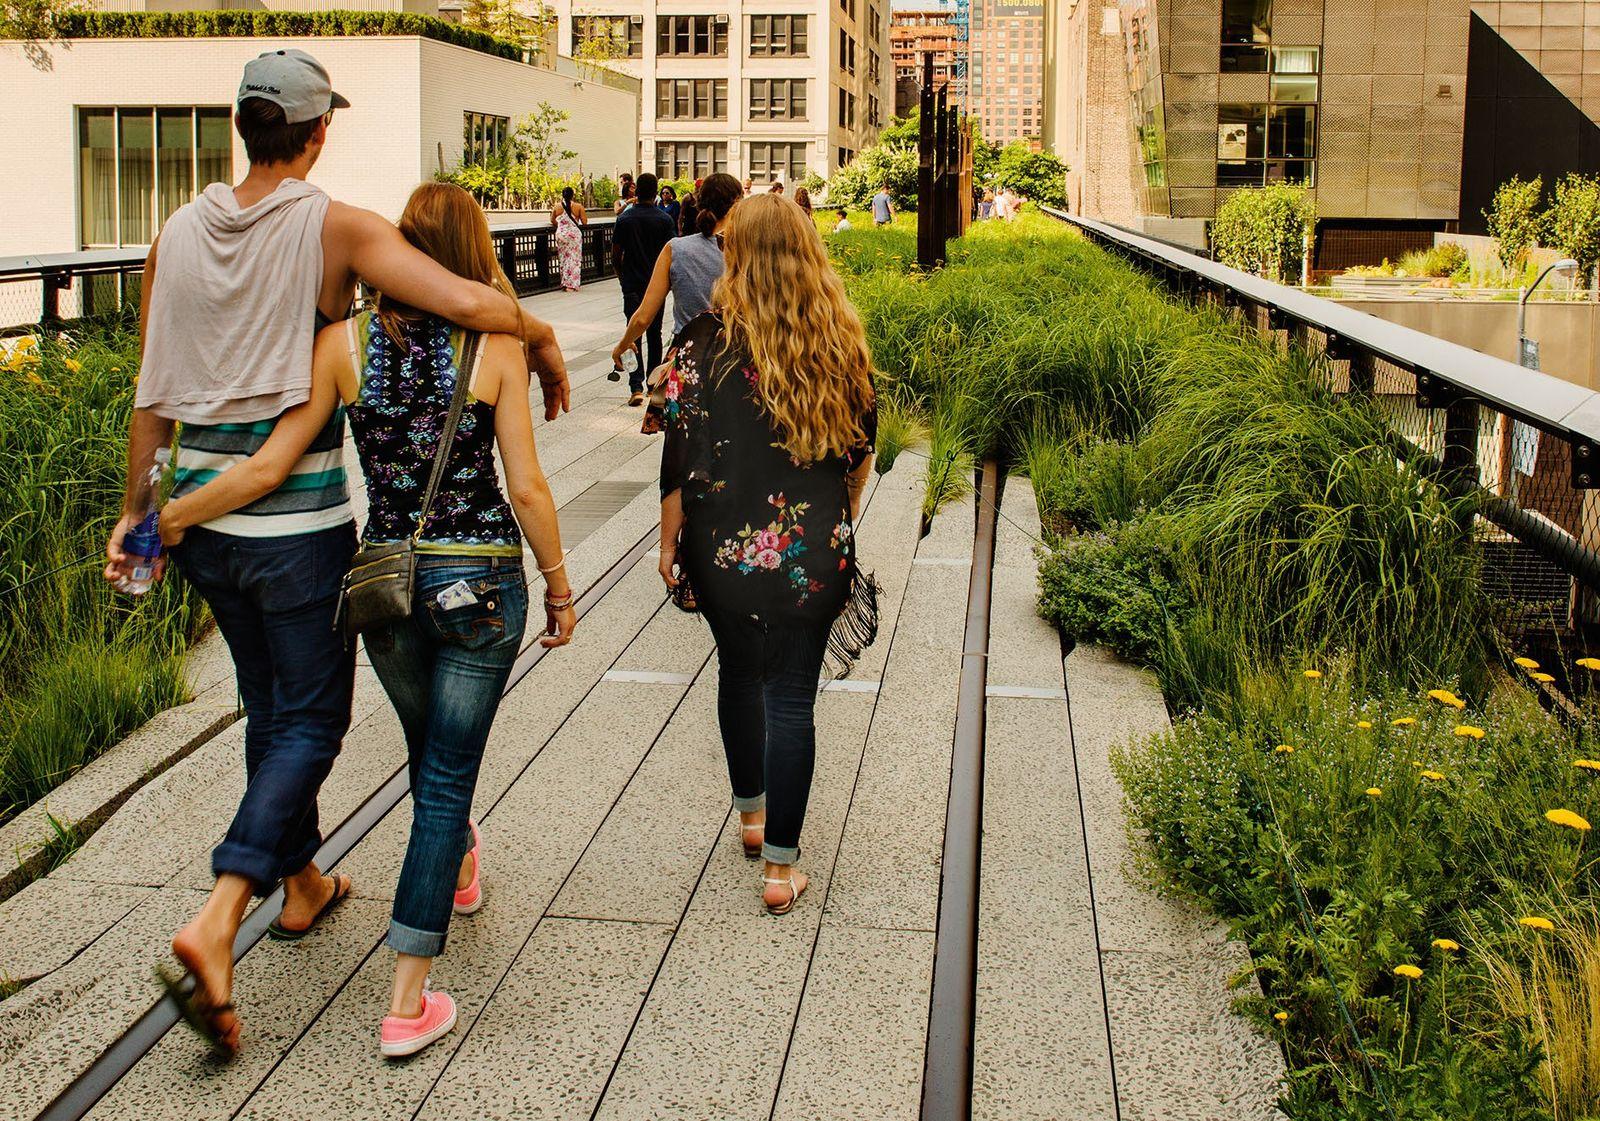 New York City: through the eyes of travel writers